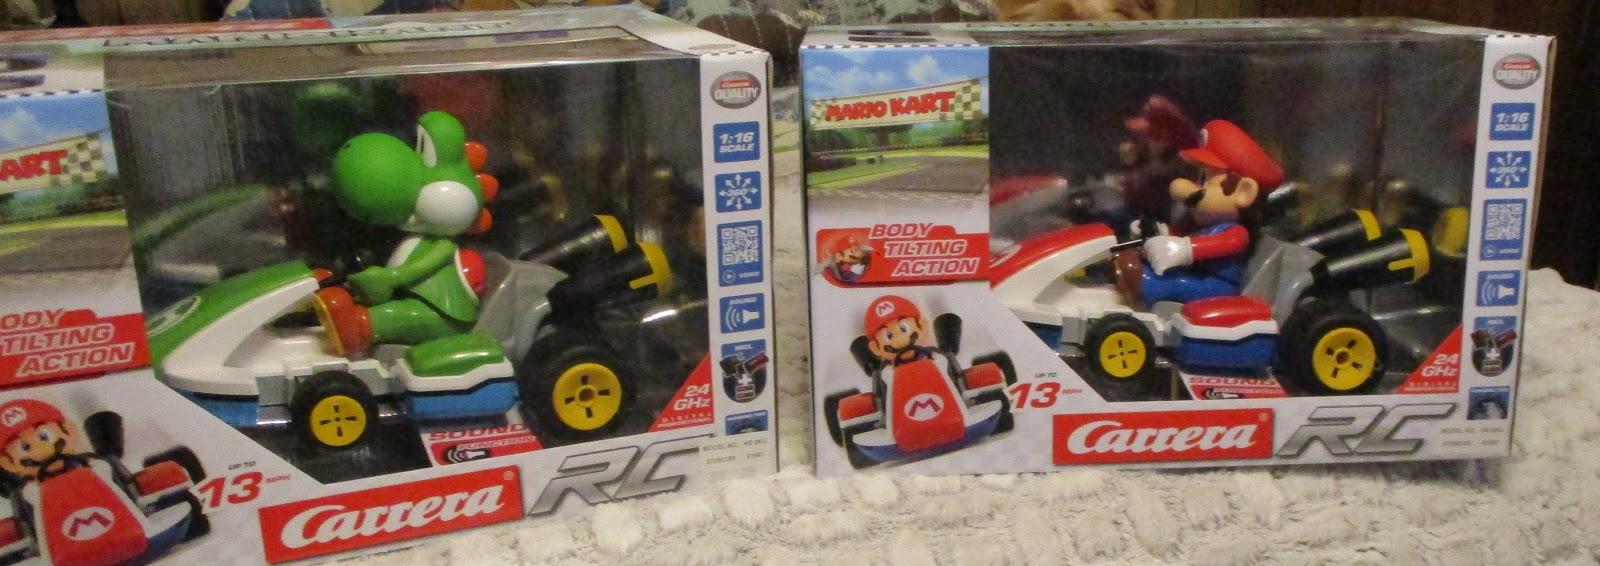 Missys Product Reviews : Hammacher Schlemmer RC Mario Kart